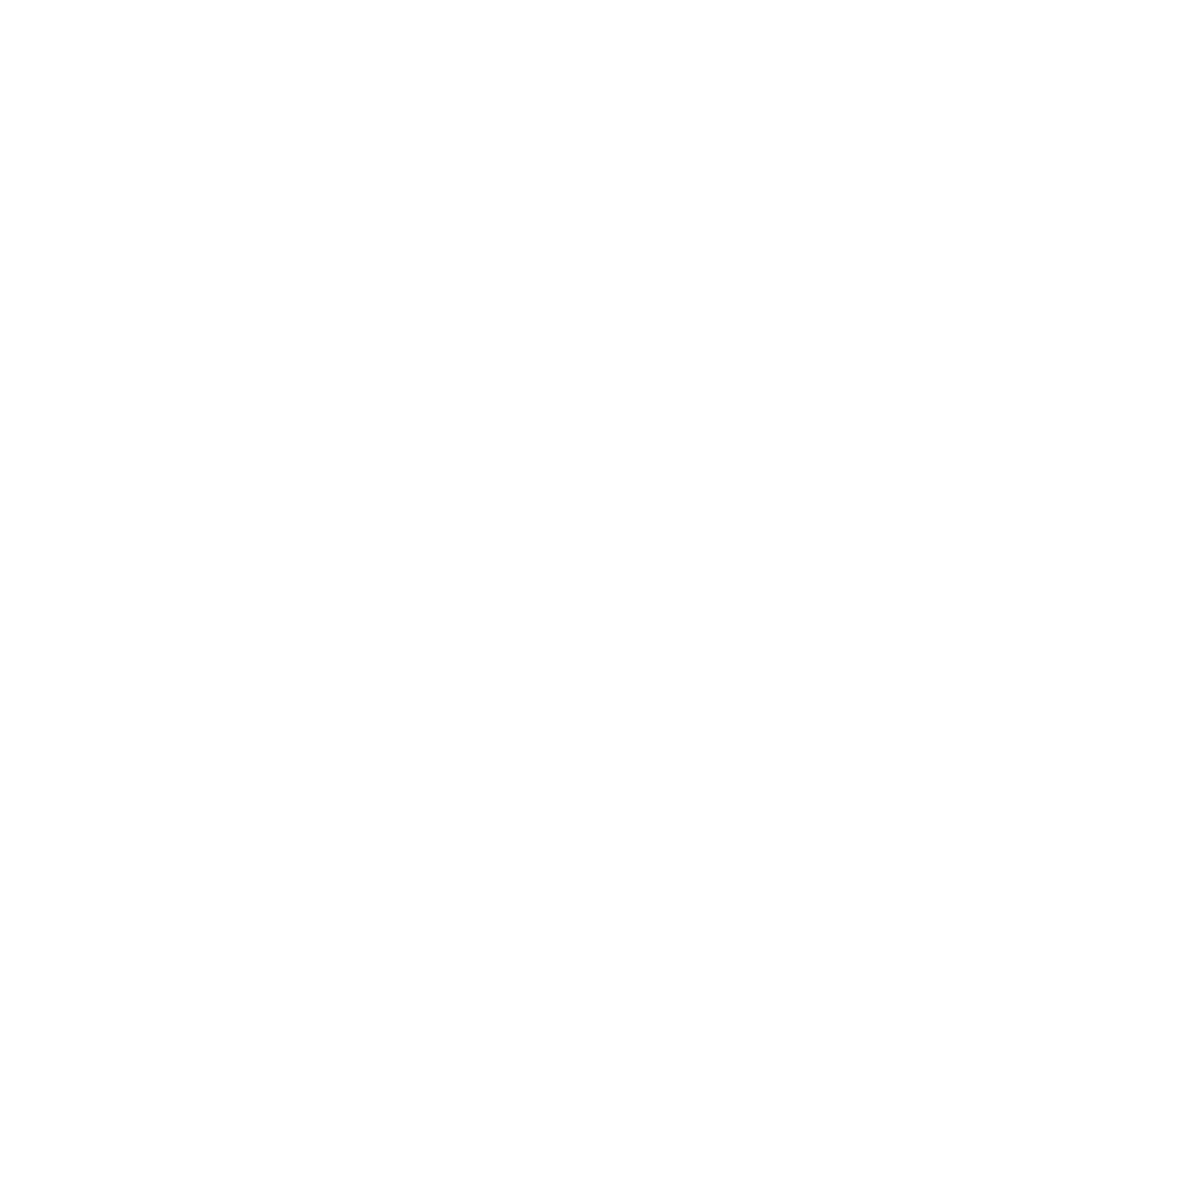 <strong>NCGLFF</strong> Jury Award Winner| TransMilitary